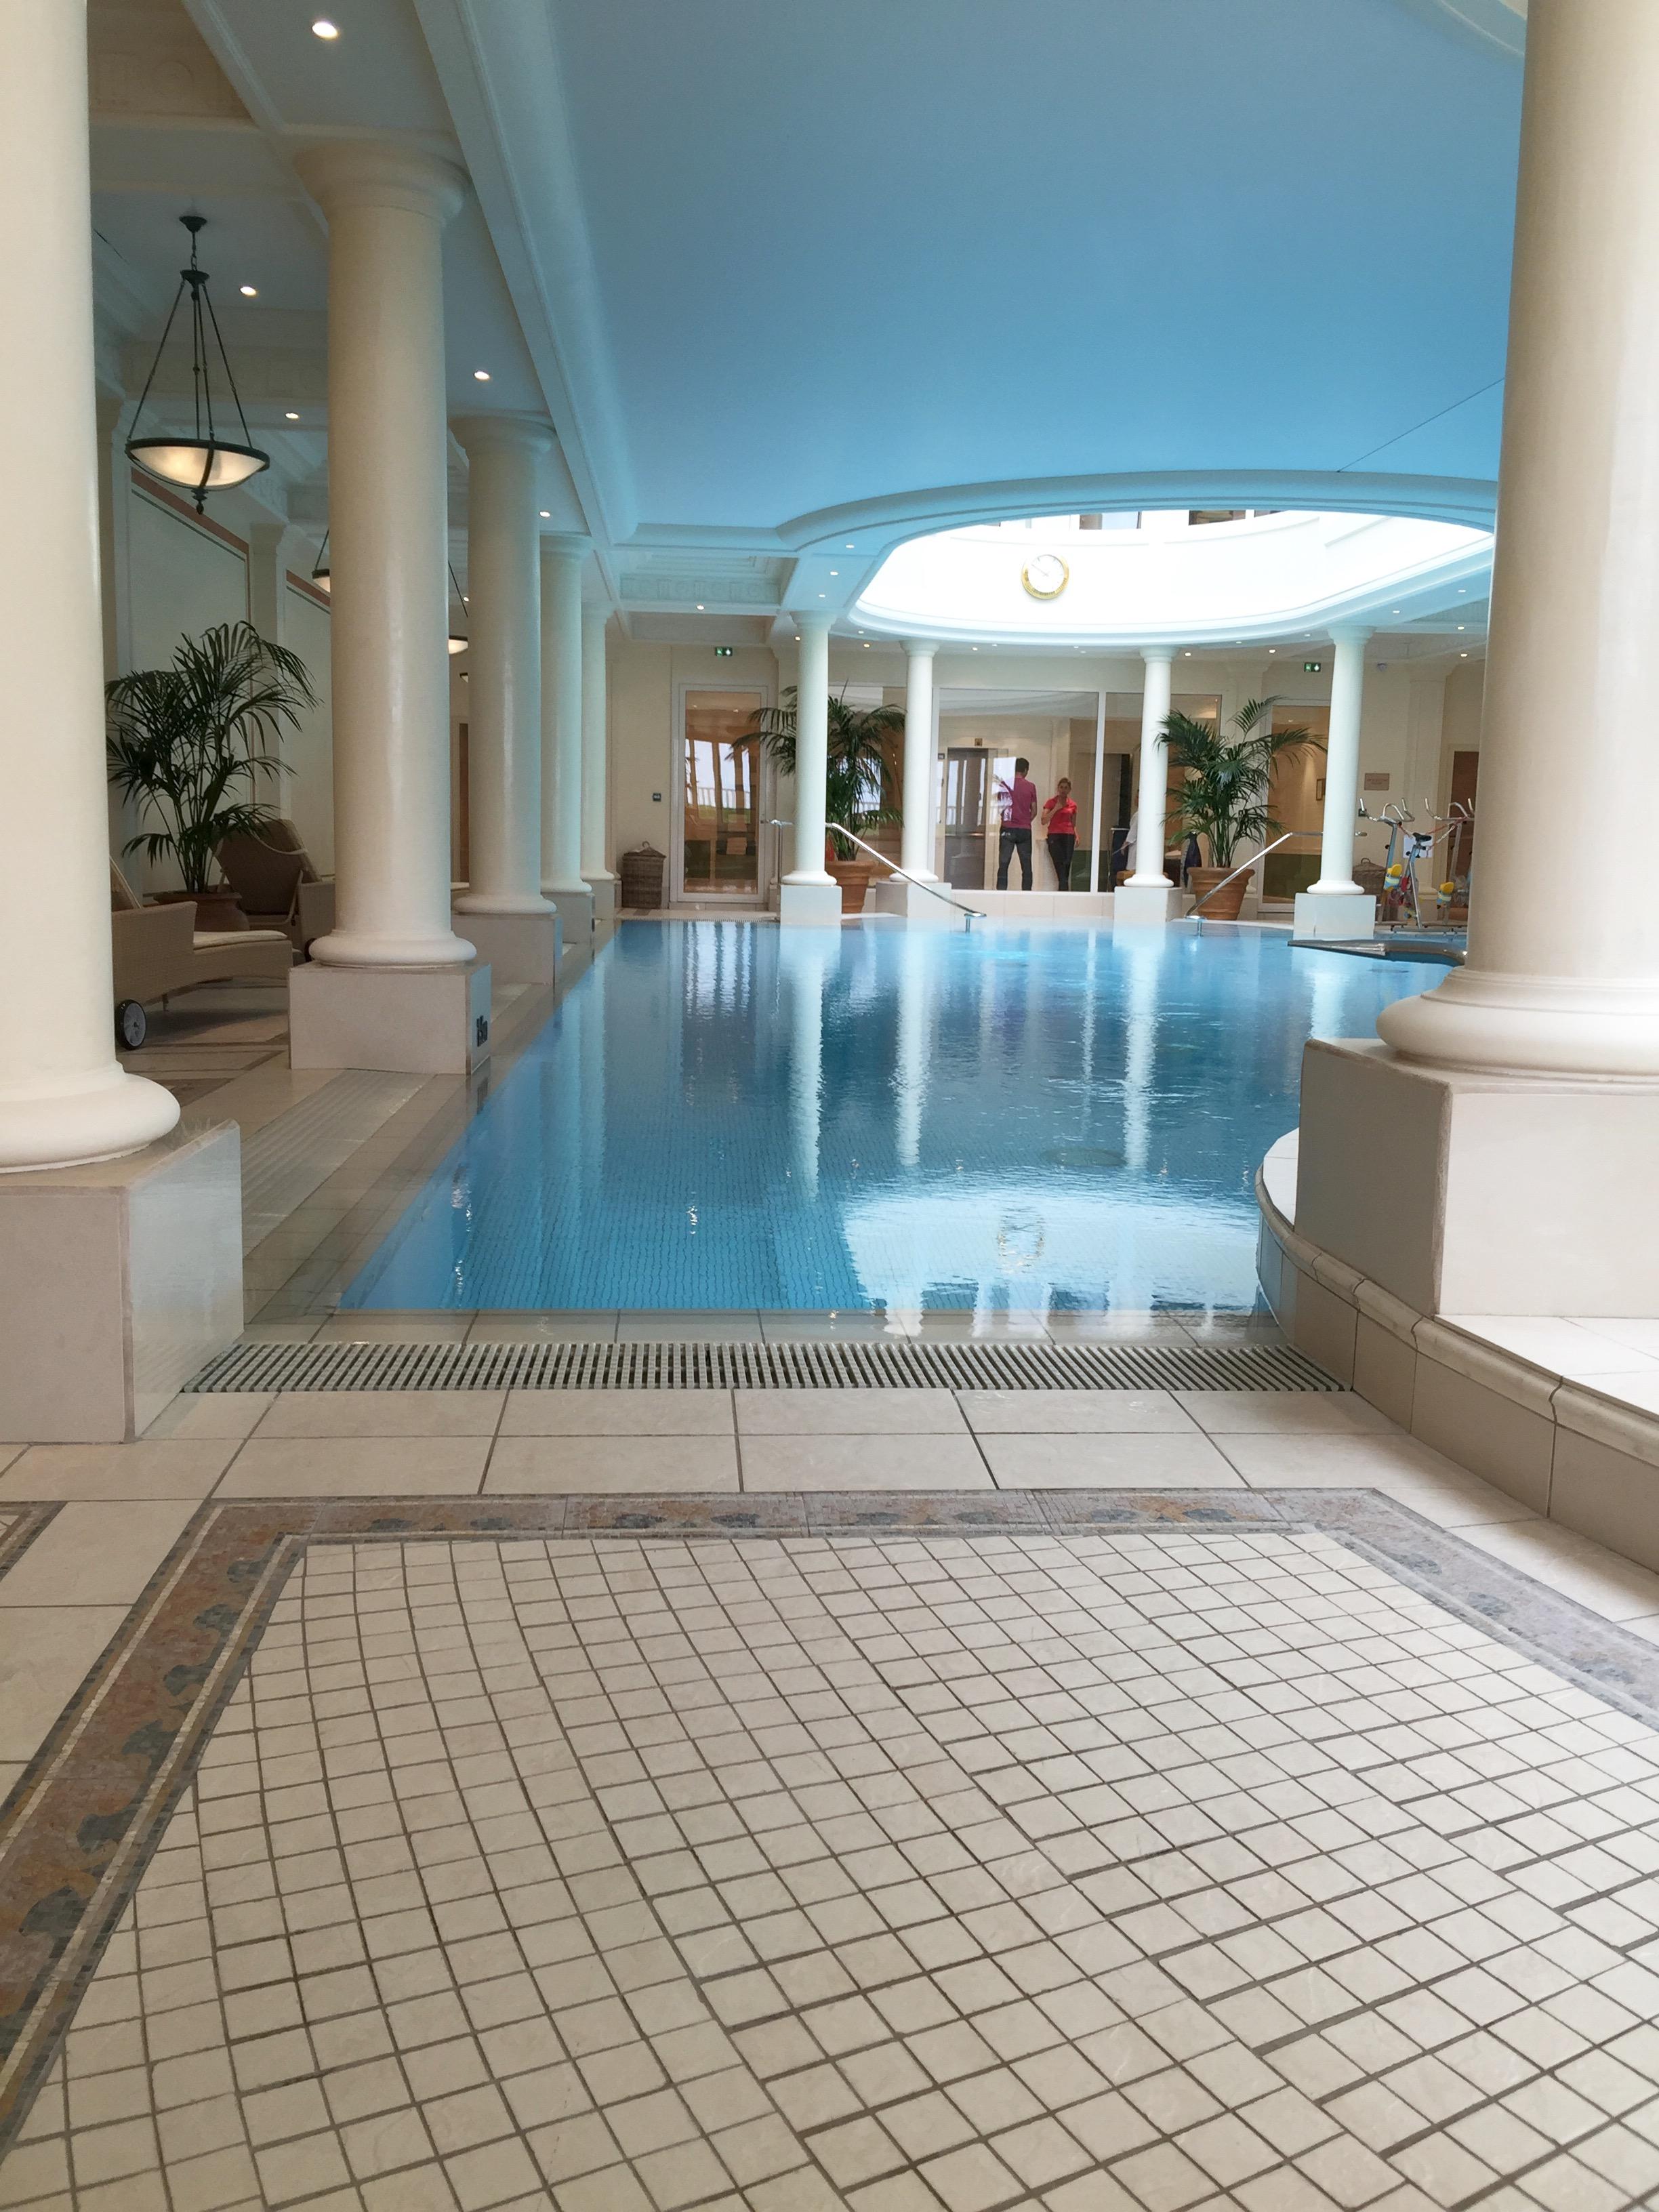 L gant transat piscine id es de bain de soleil for Transat piscine